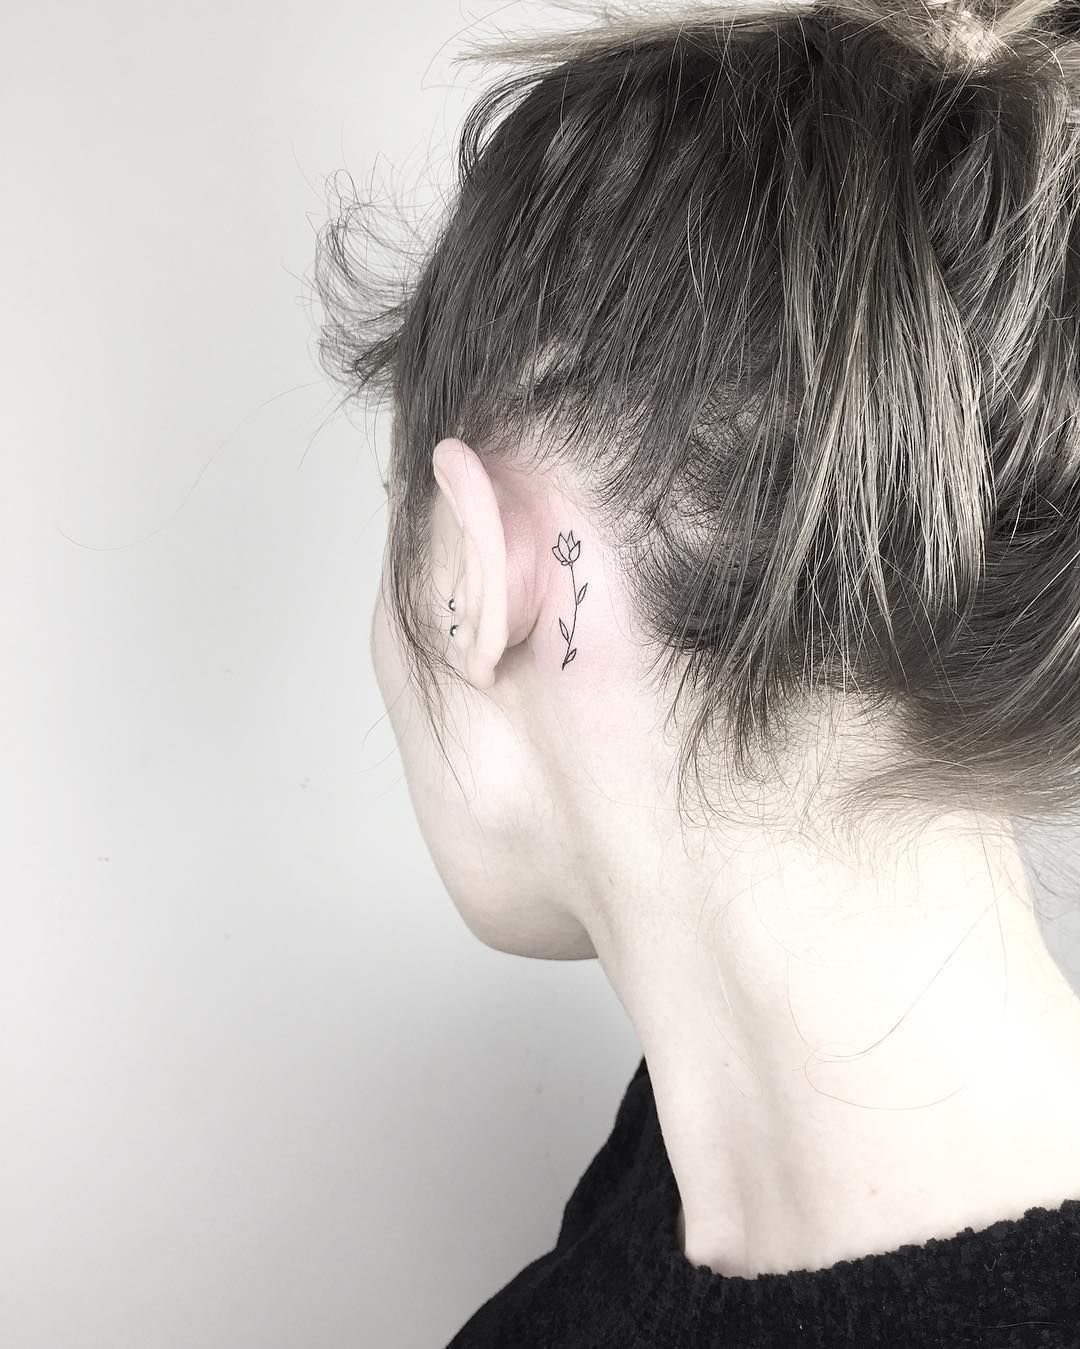 Behind The Ear Flower Tattoo Behind Ear Tattoos Flower Tattoo Ear Tulip Tattoo